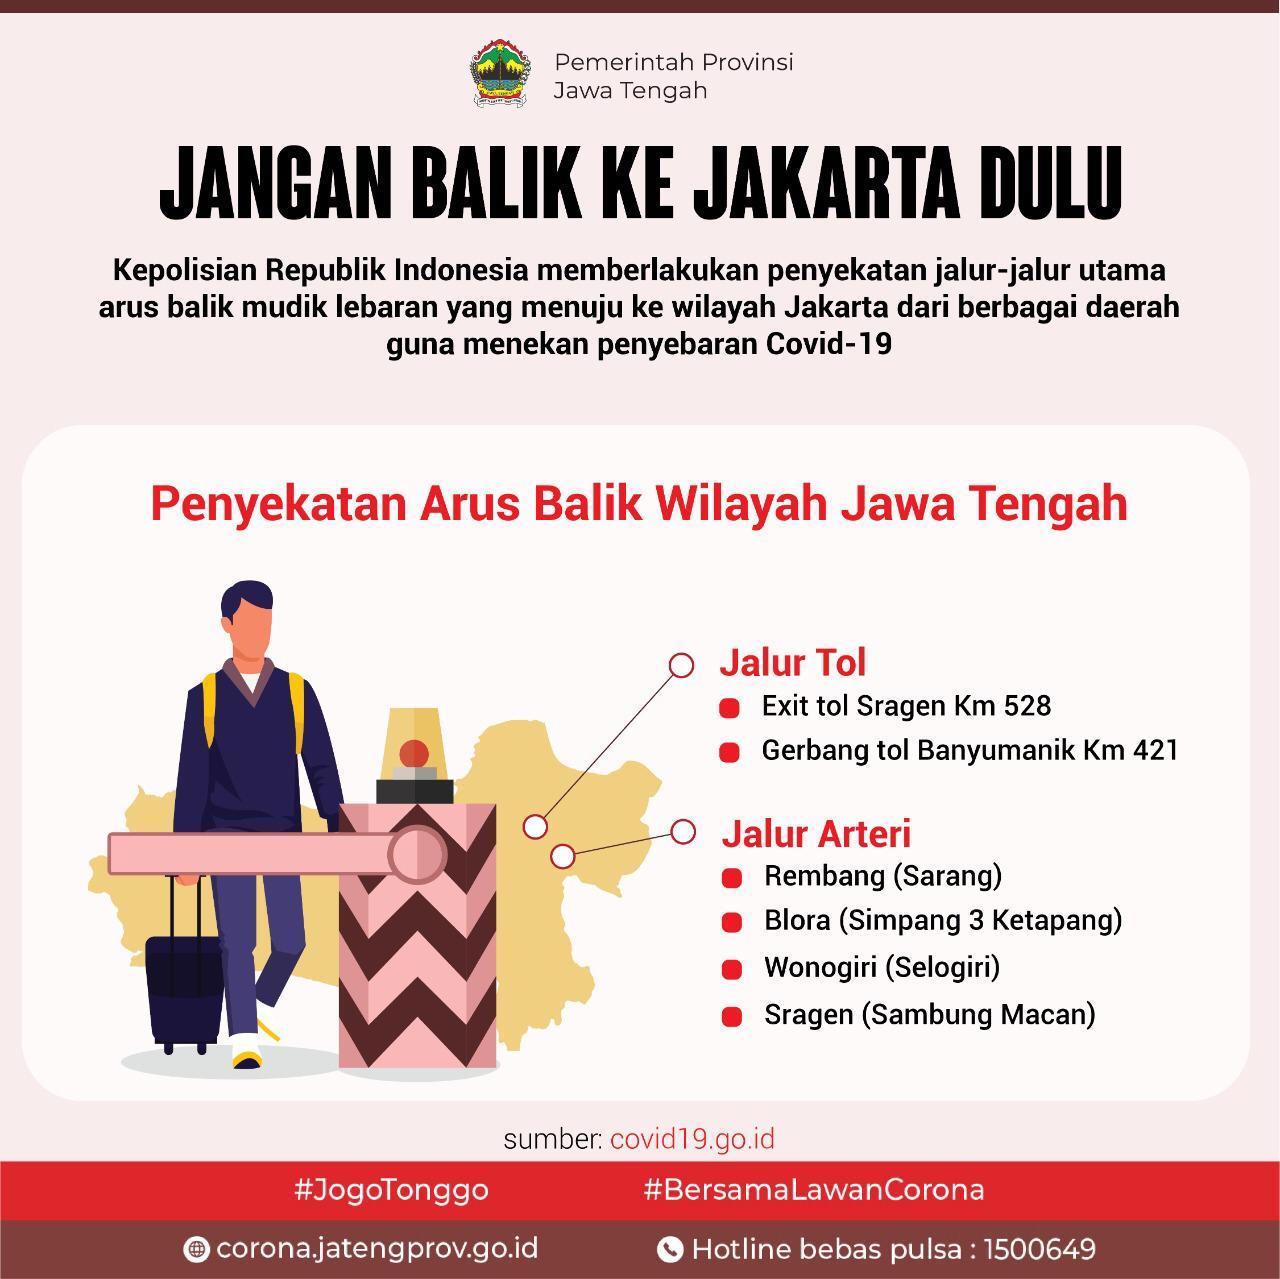 Jangan Kembali ke Jakarta Dulu